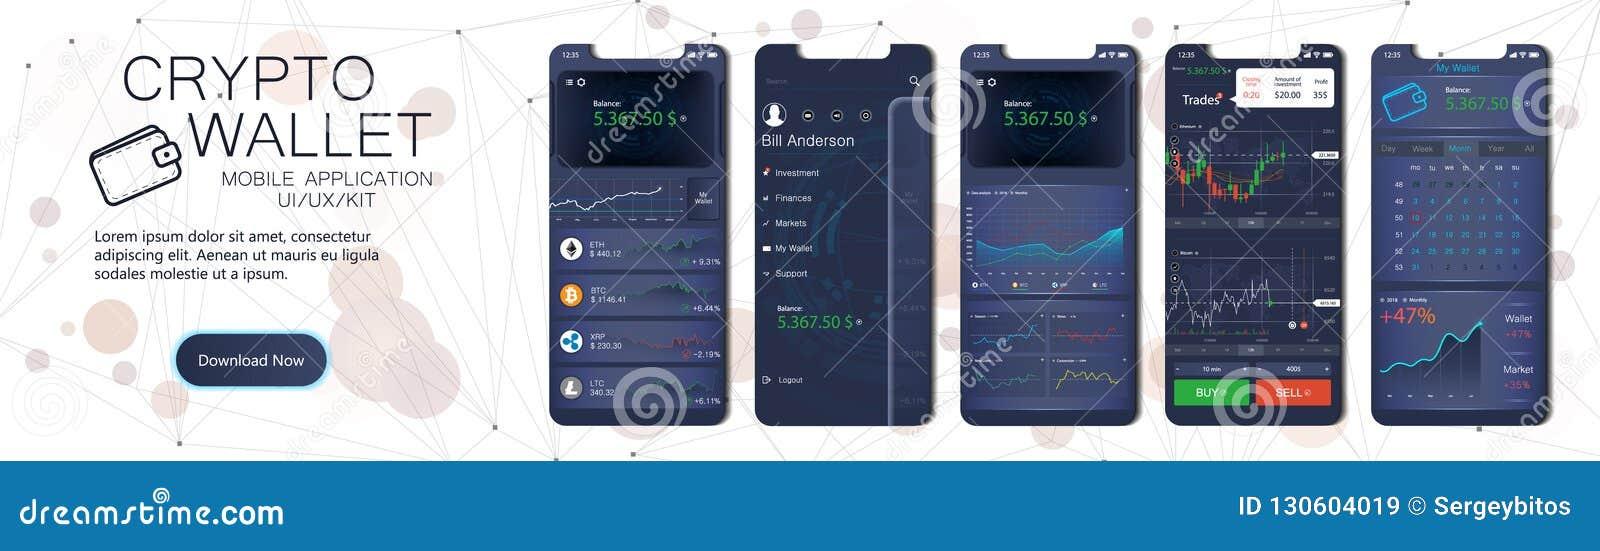 Molde móvel do app da carteira cripto